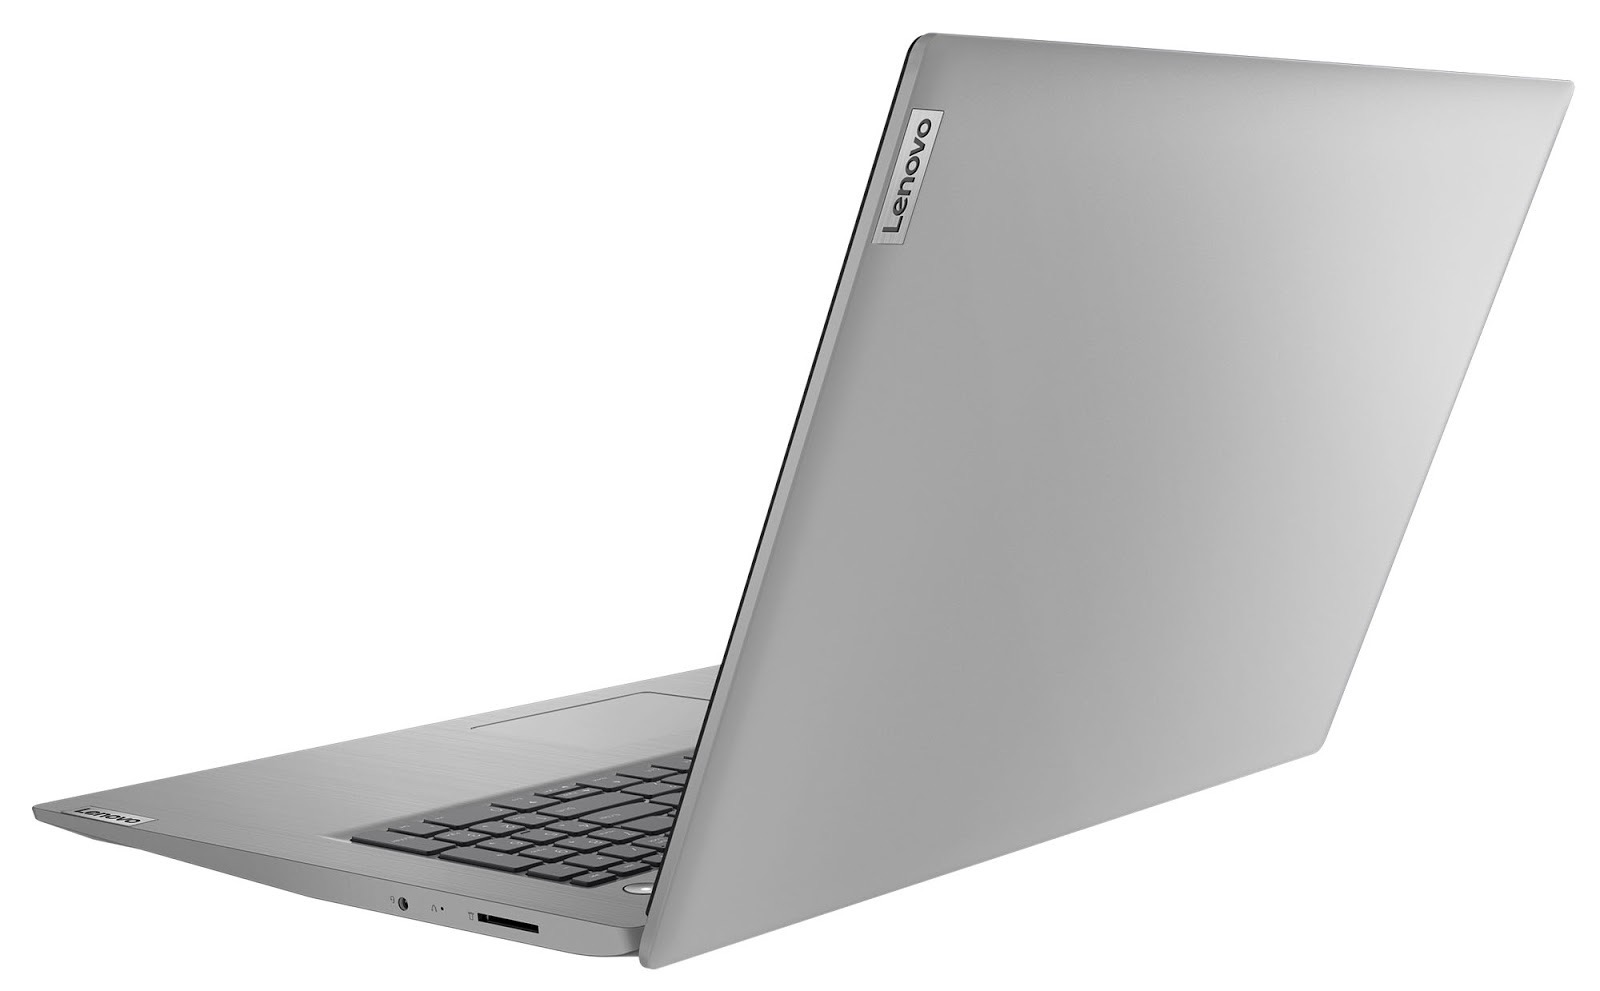 Фото 1. Ноутбук Lenovo ideapad 3 17ADA05 Platinum Grey (81W20046RE)